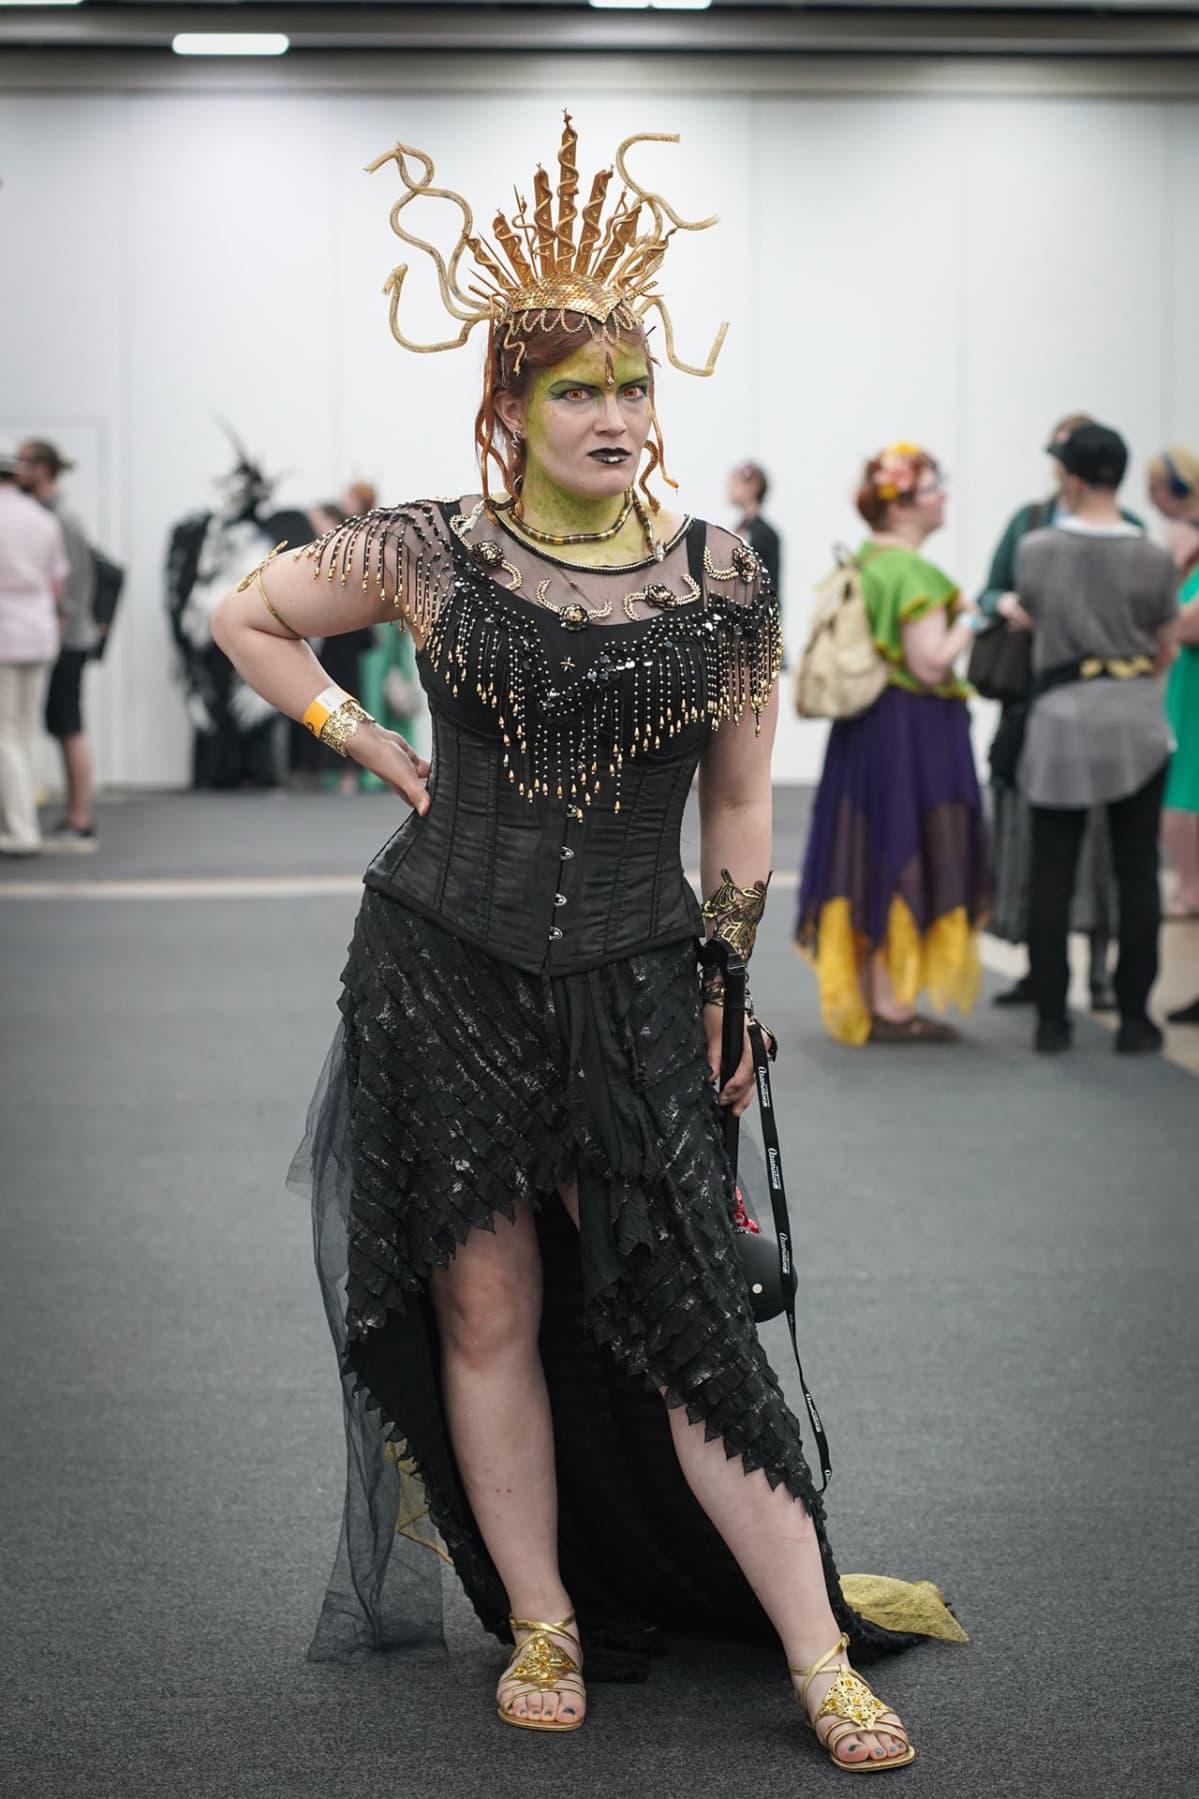 Pinja Kouvonen, Medusa. Ropecon